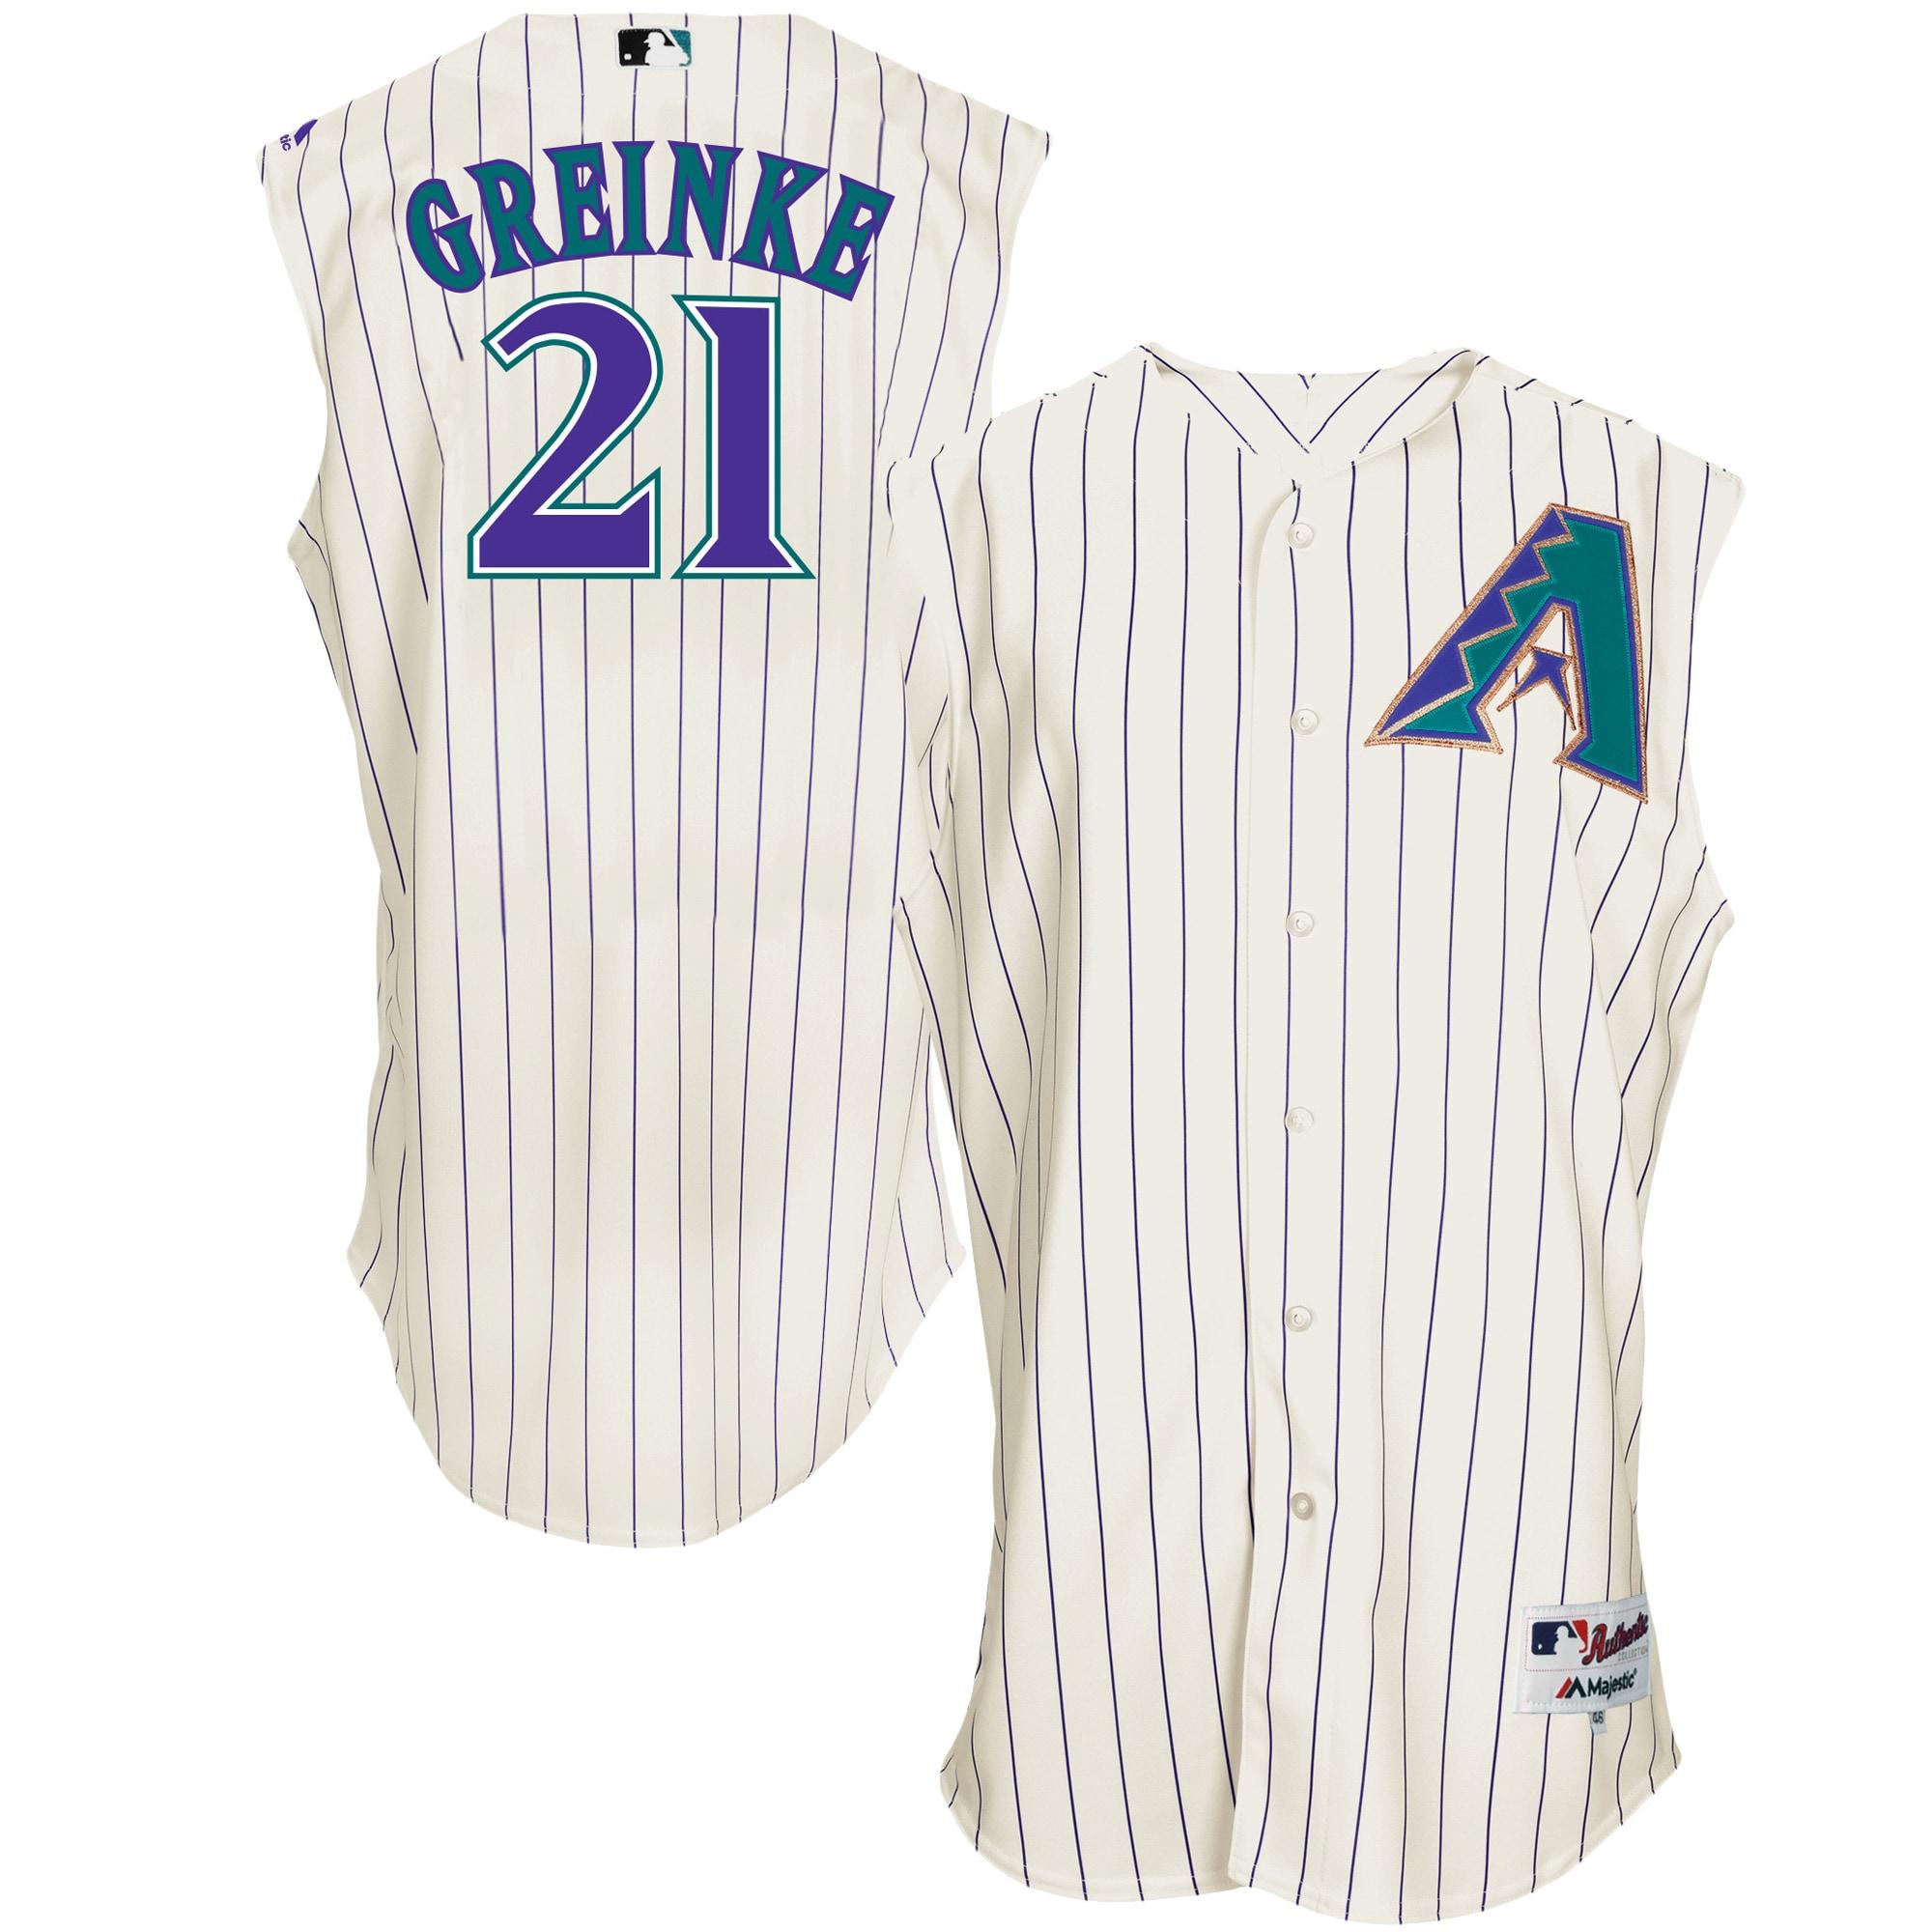 Zack Greinke Arizona Diamondbacks Majestic Turn Back the Clock Authentic Player Jersey - White